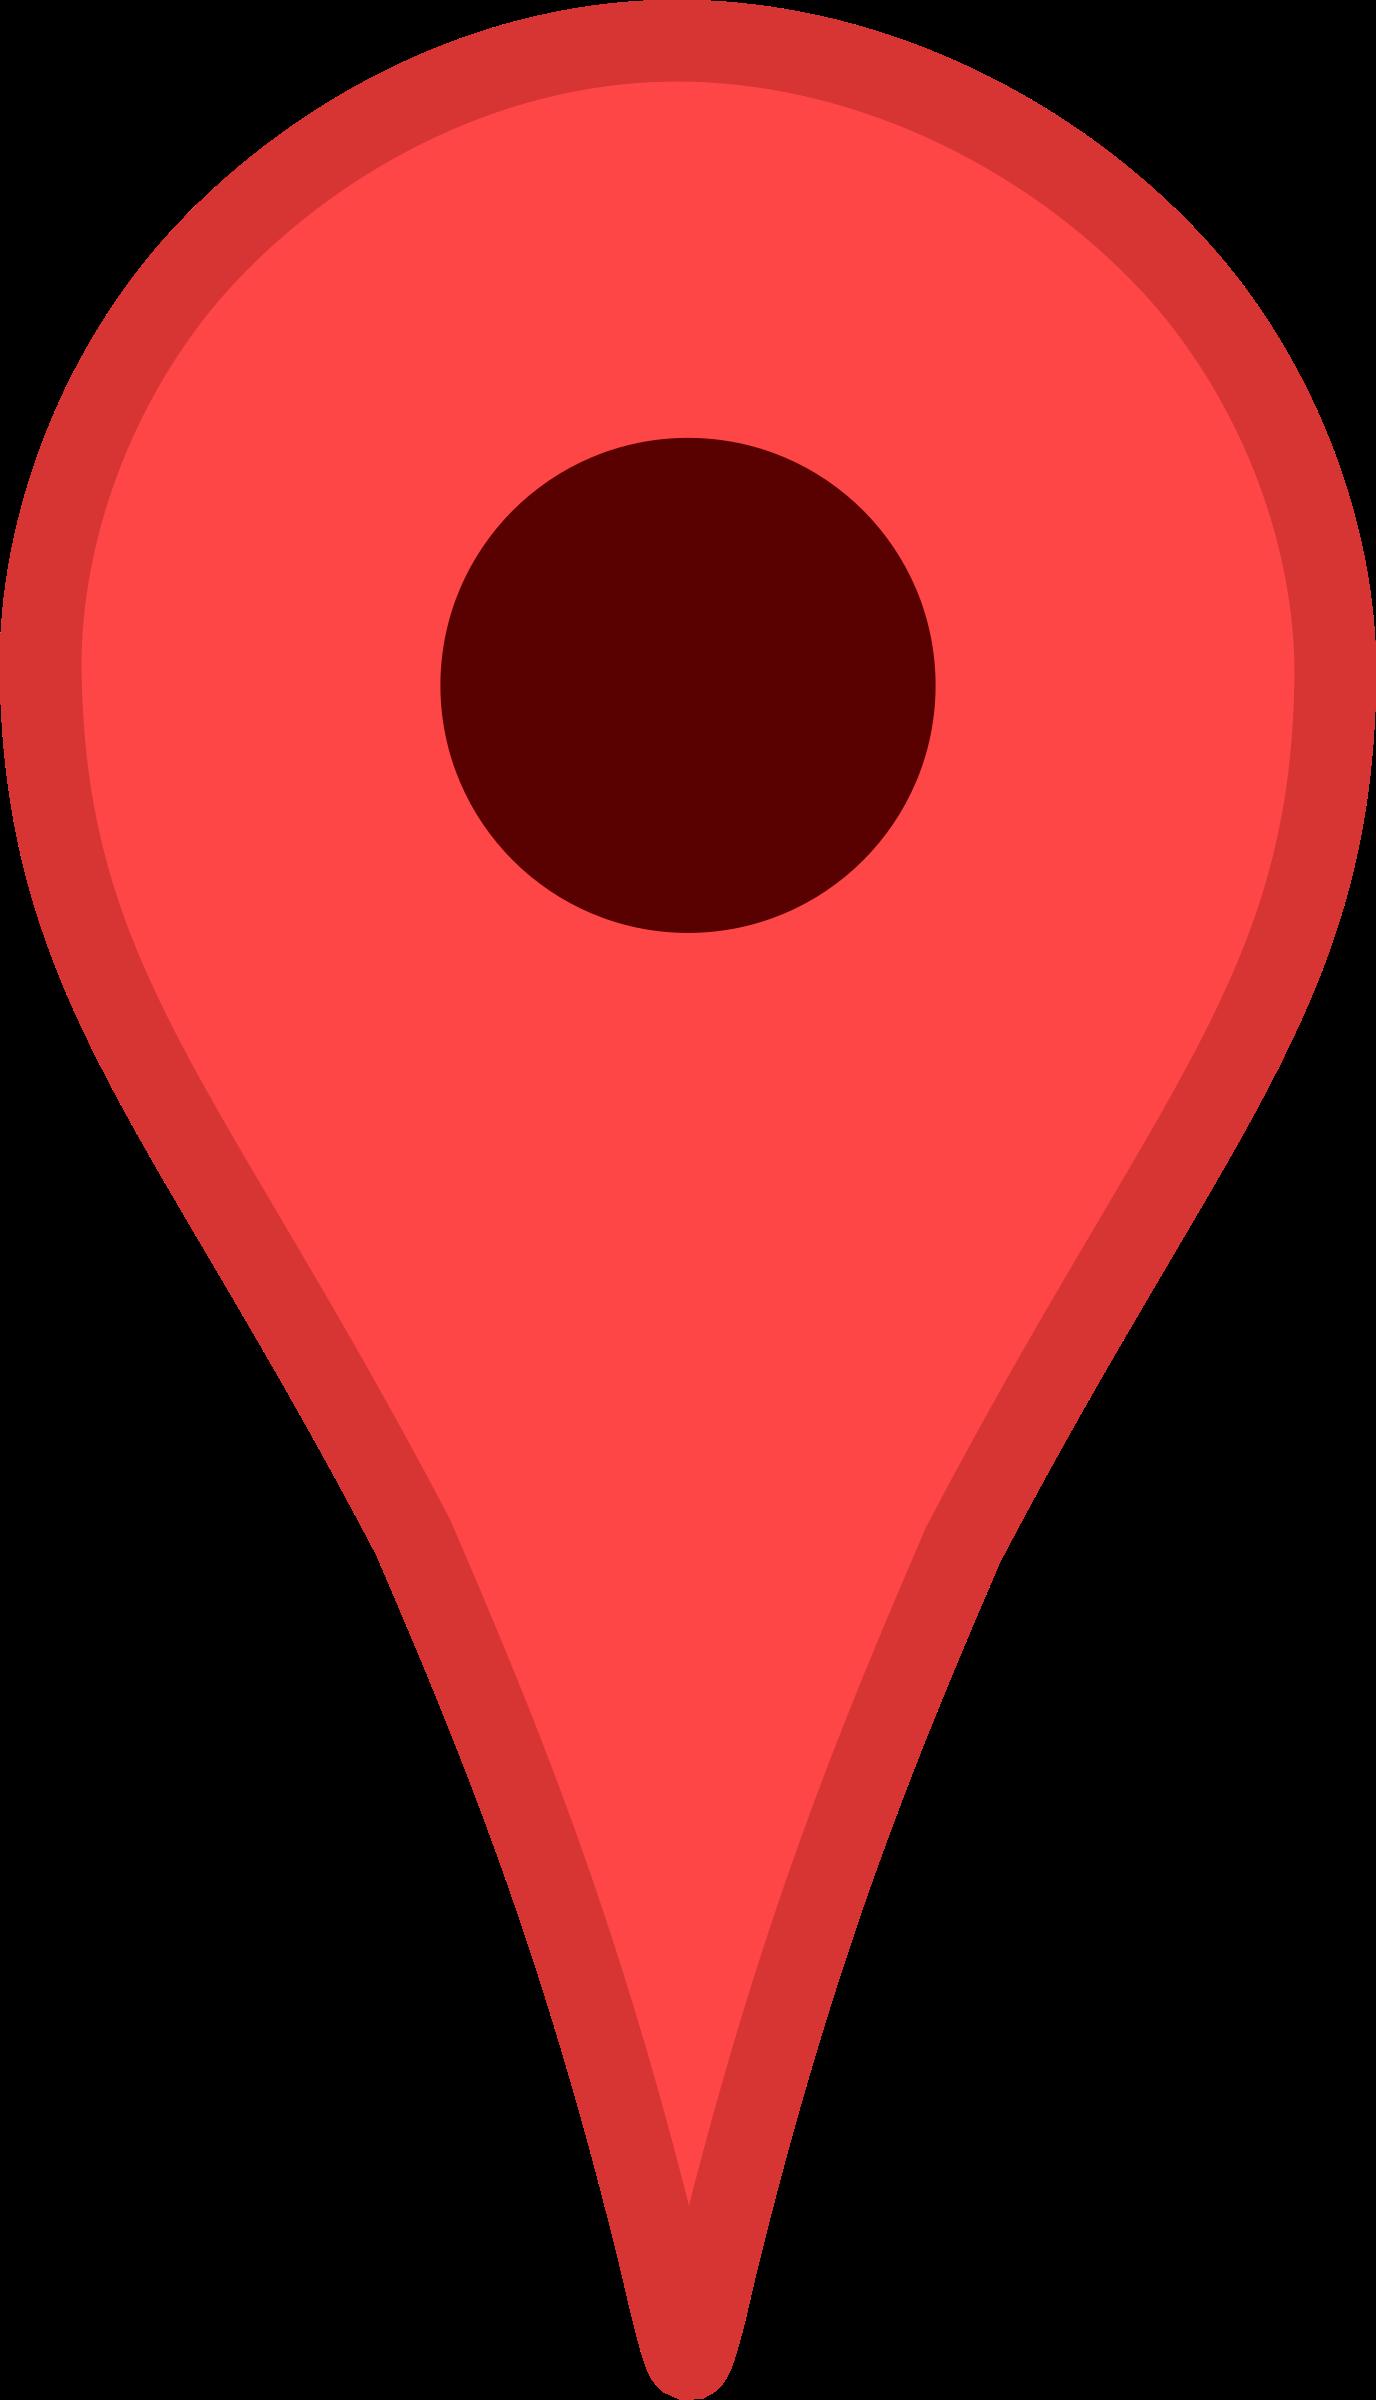 Clipart heart map. Pin big image png